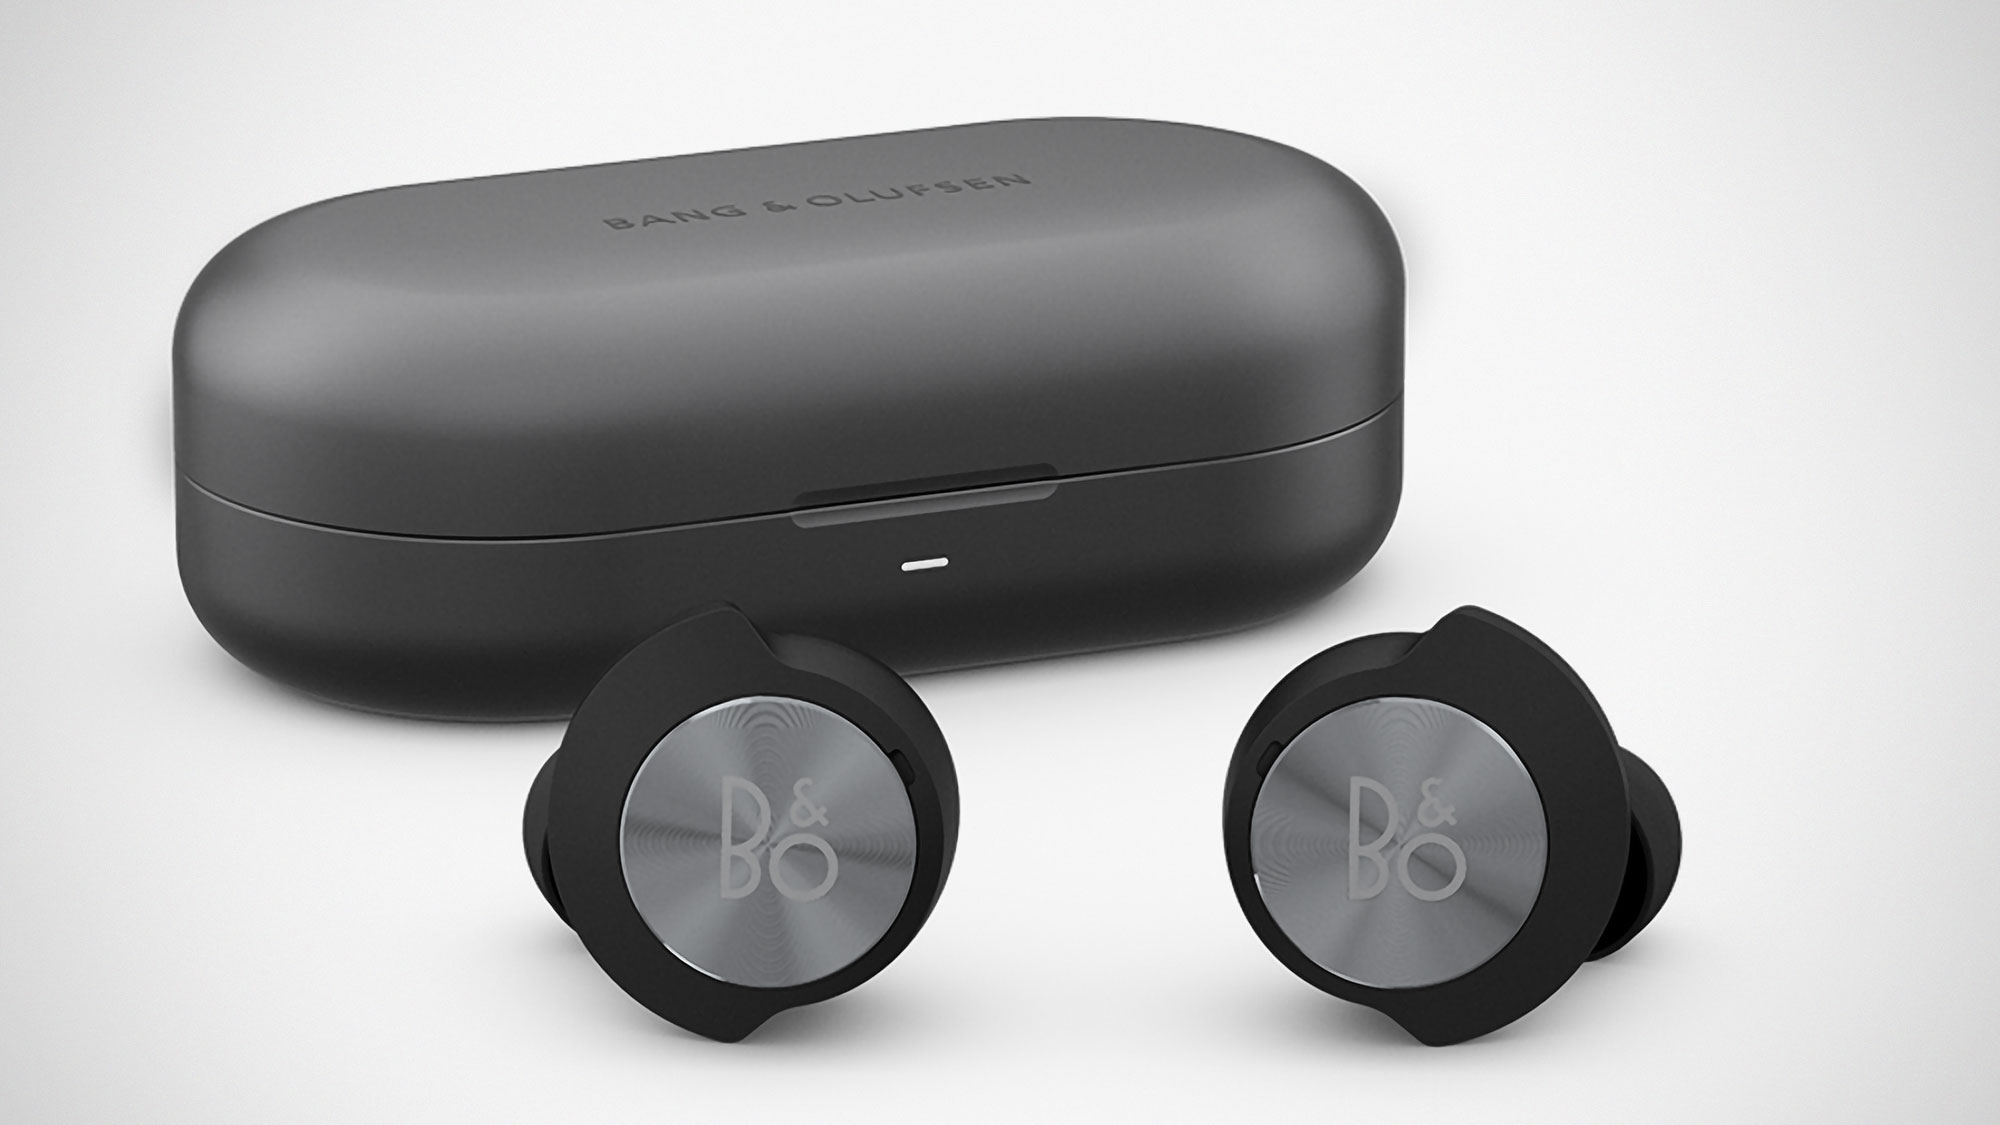 Bang & Olufsen Beoplay EQ Wireless Earphones